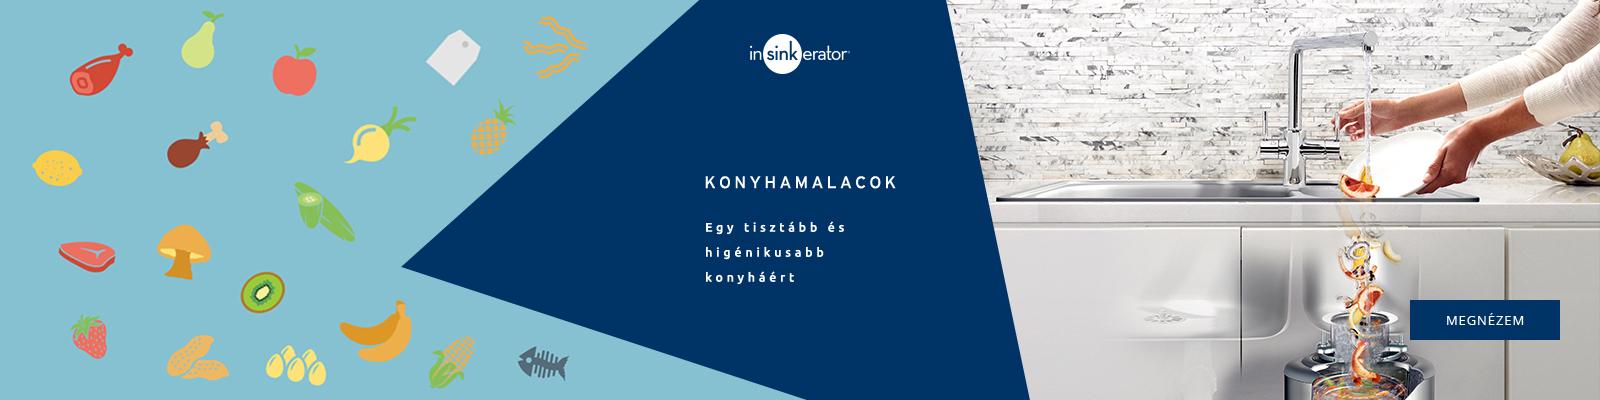 Konyhamalacok - InSinkErator